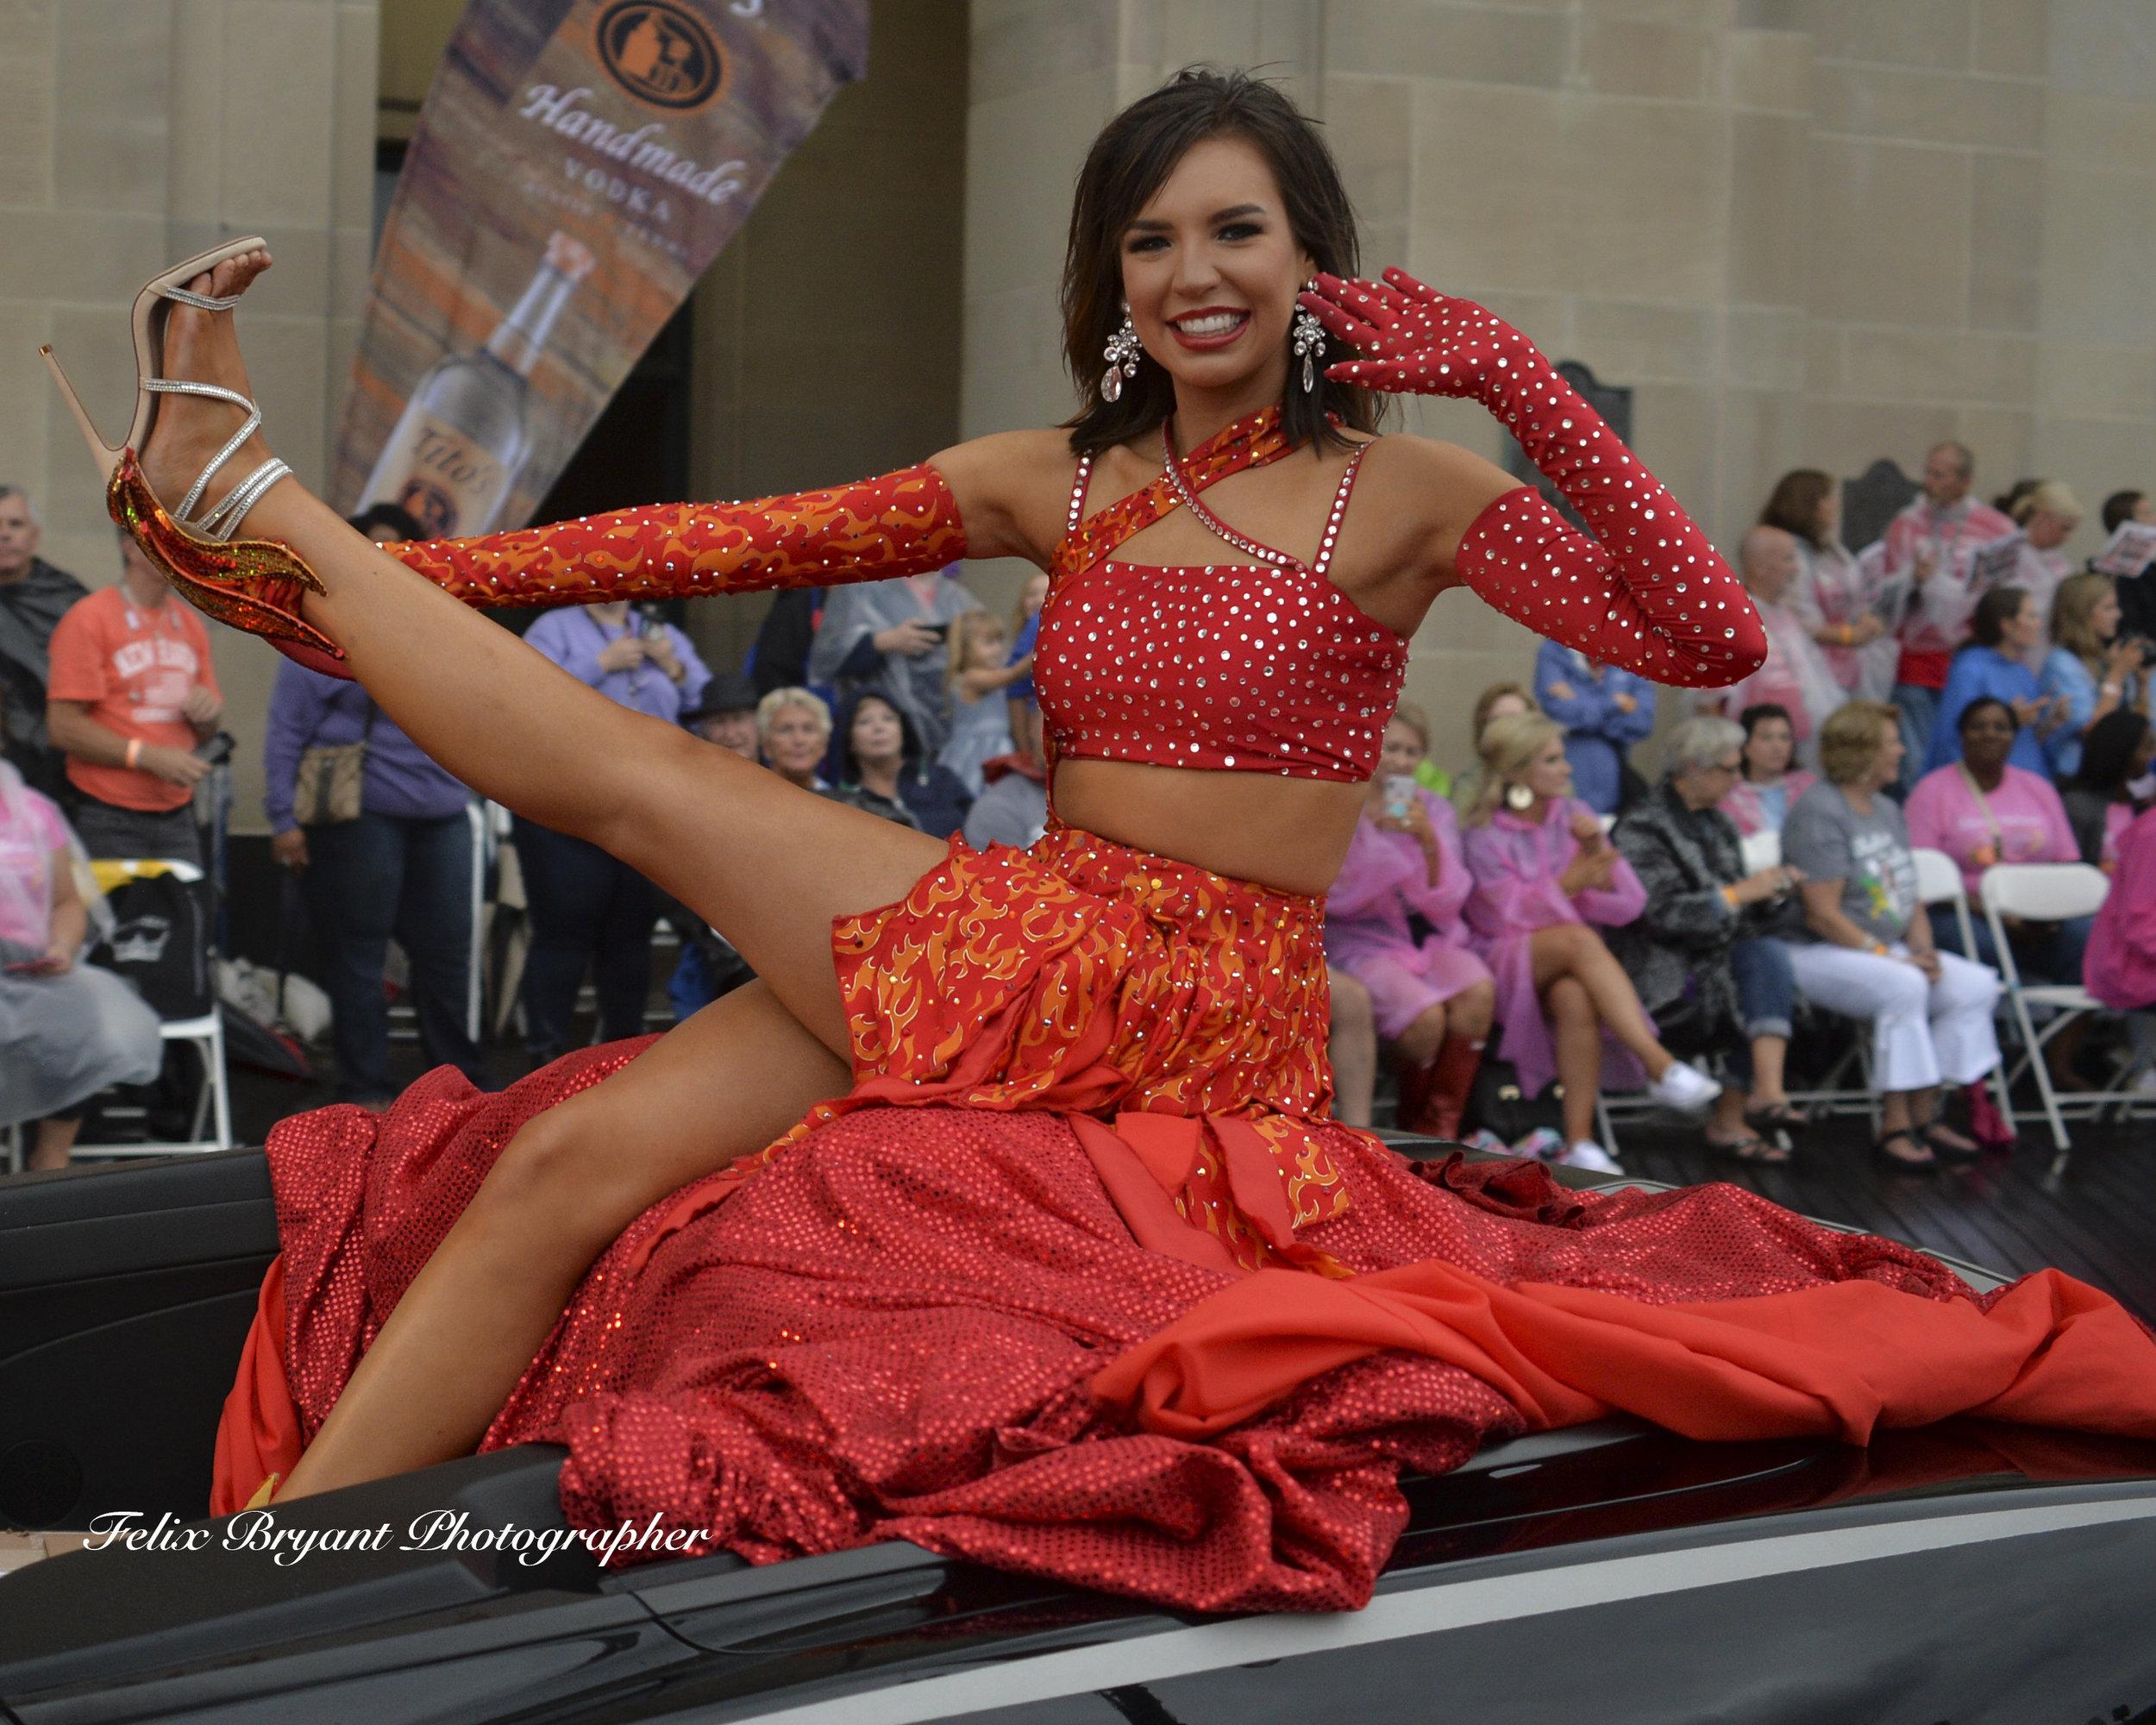 2018 09.08.18 Miss America 2.0  Felix Bryant Photographer ©201820180908_0088.jpg